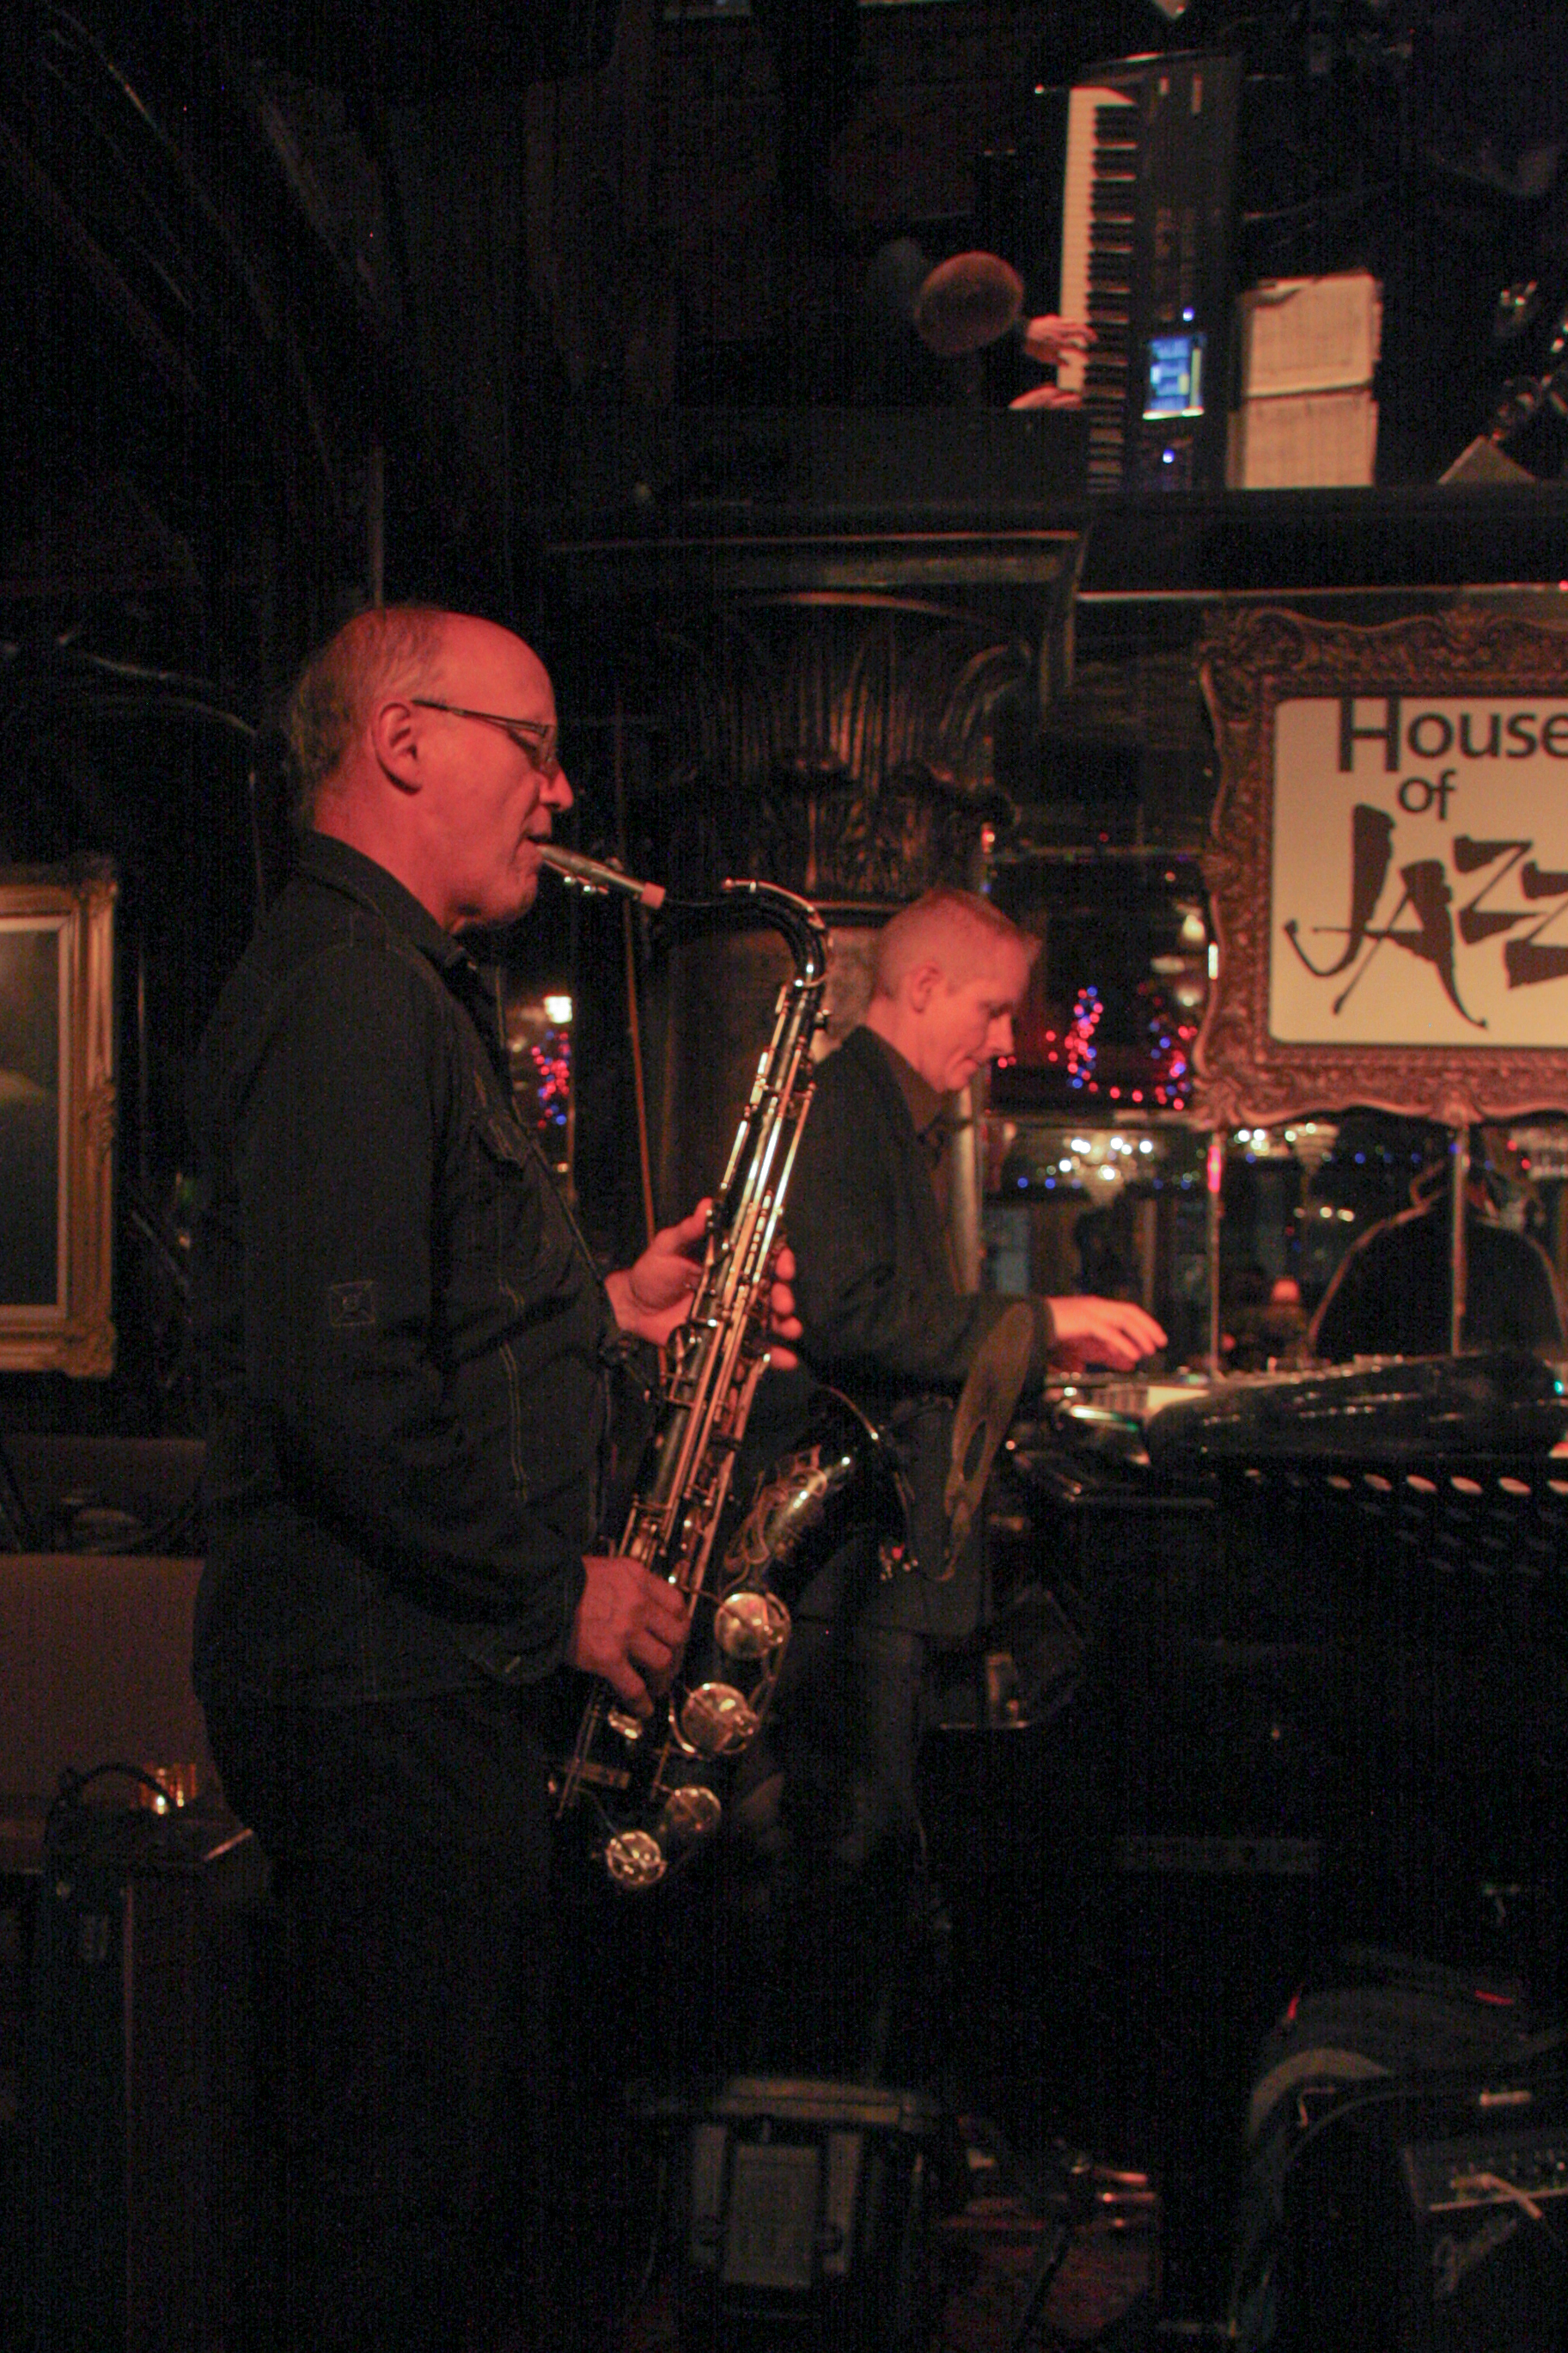 House of Jazz-4597.jpg